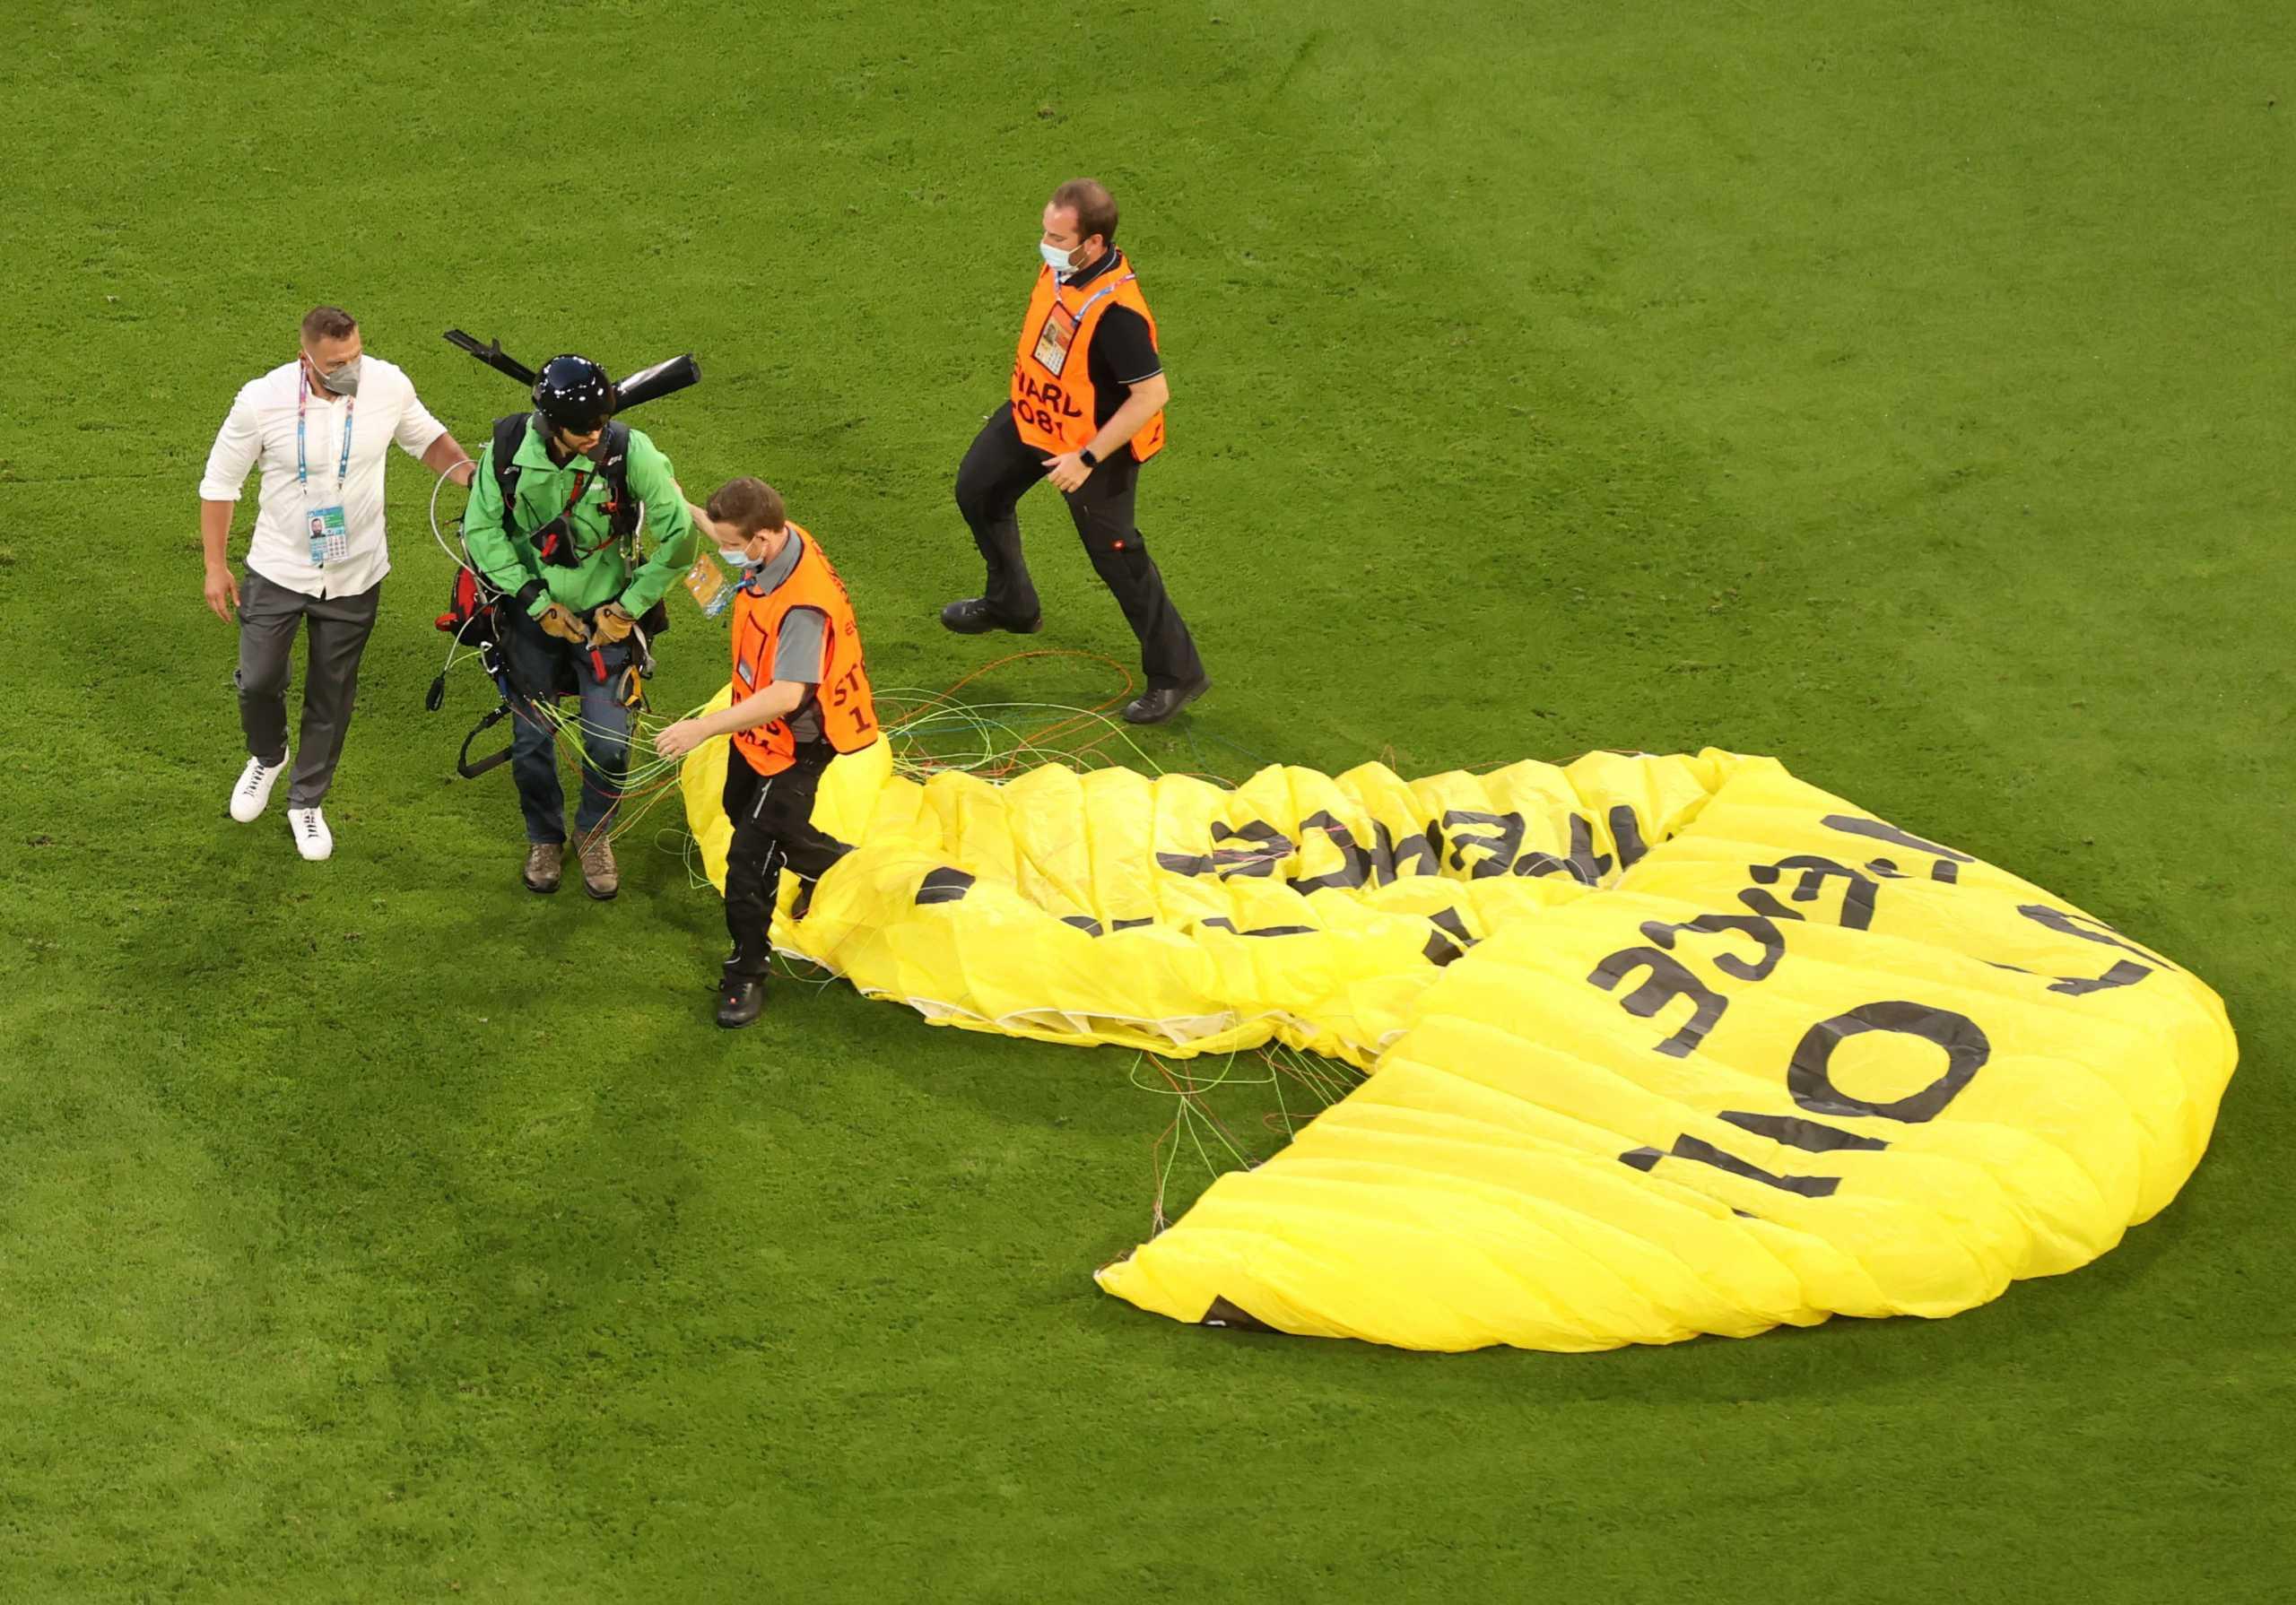 Euro 2020: Ελεύθεροι σκοπευτές περίμεναν εντολή για να σκοτώσουν τον εισβολέα με το ανεμόπτερο